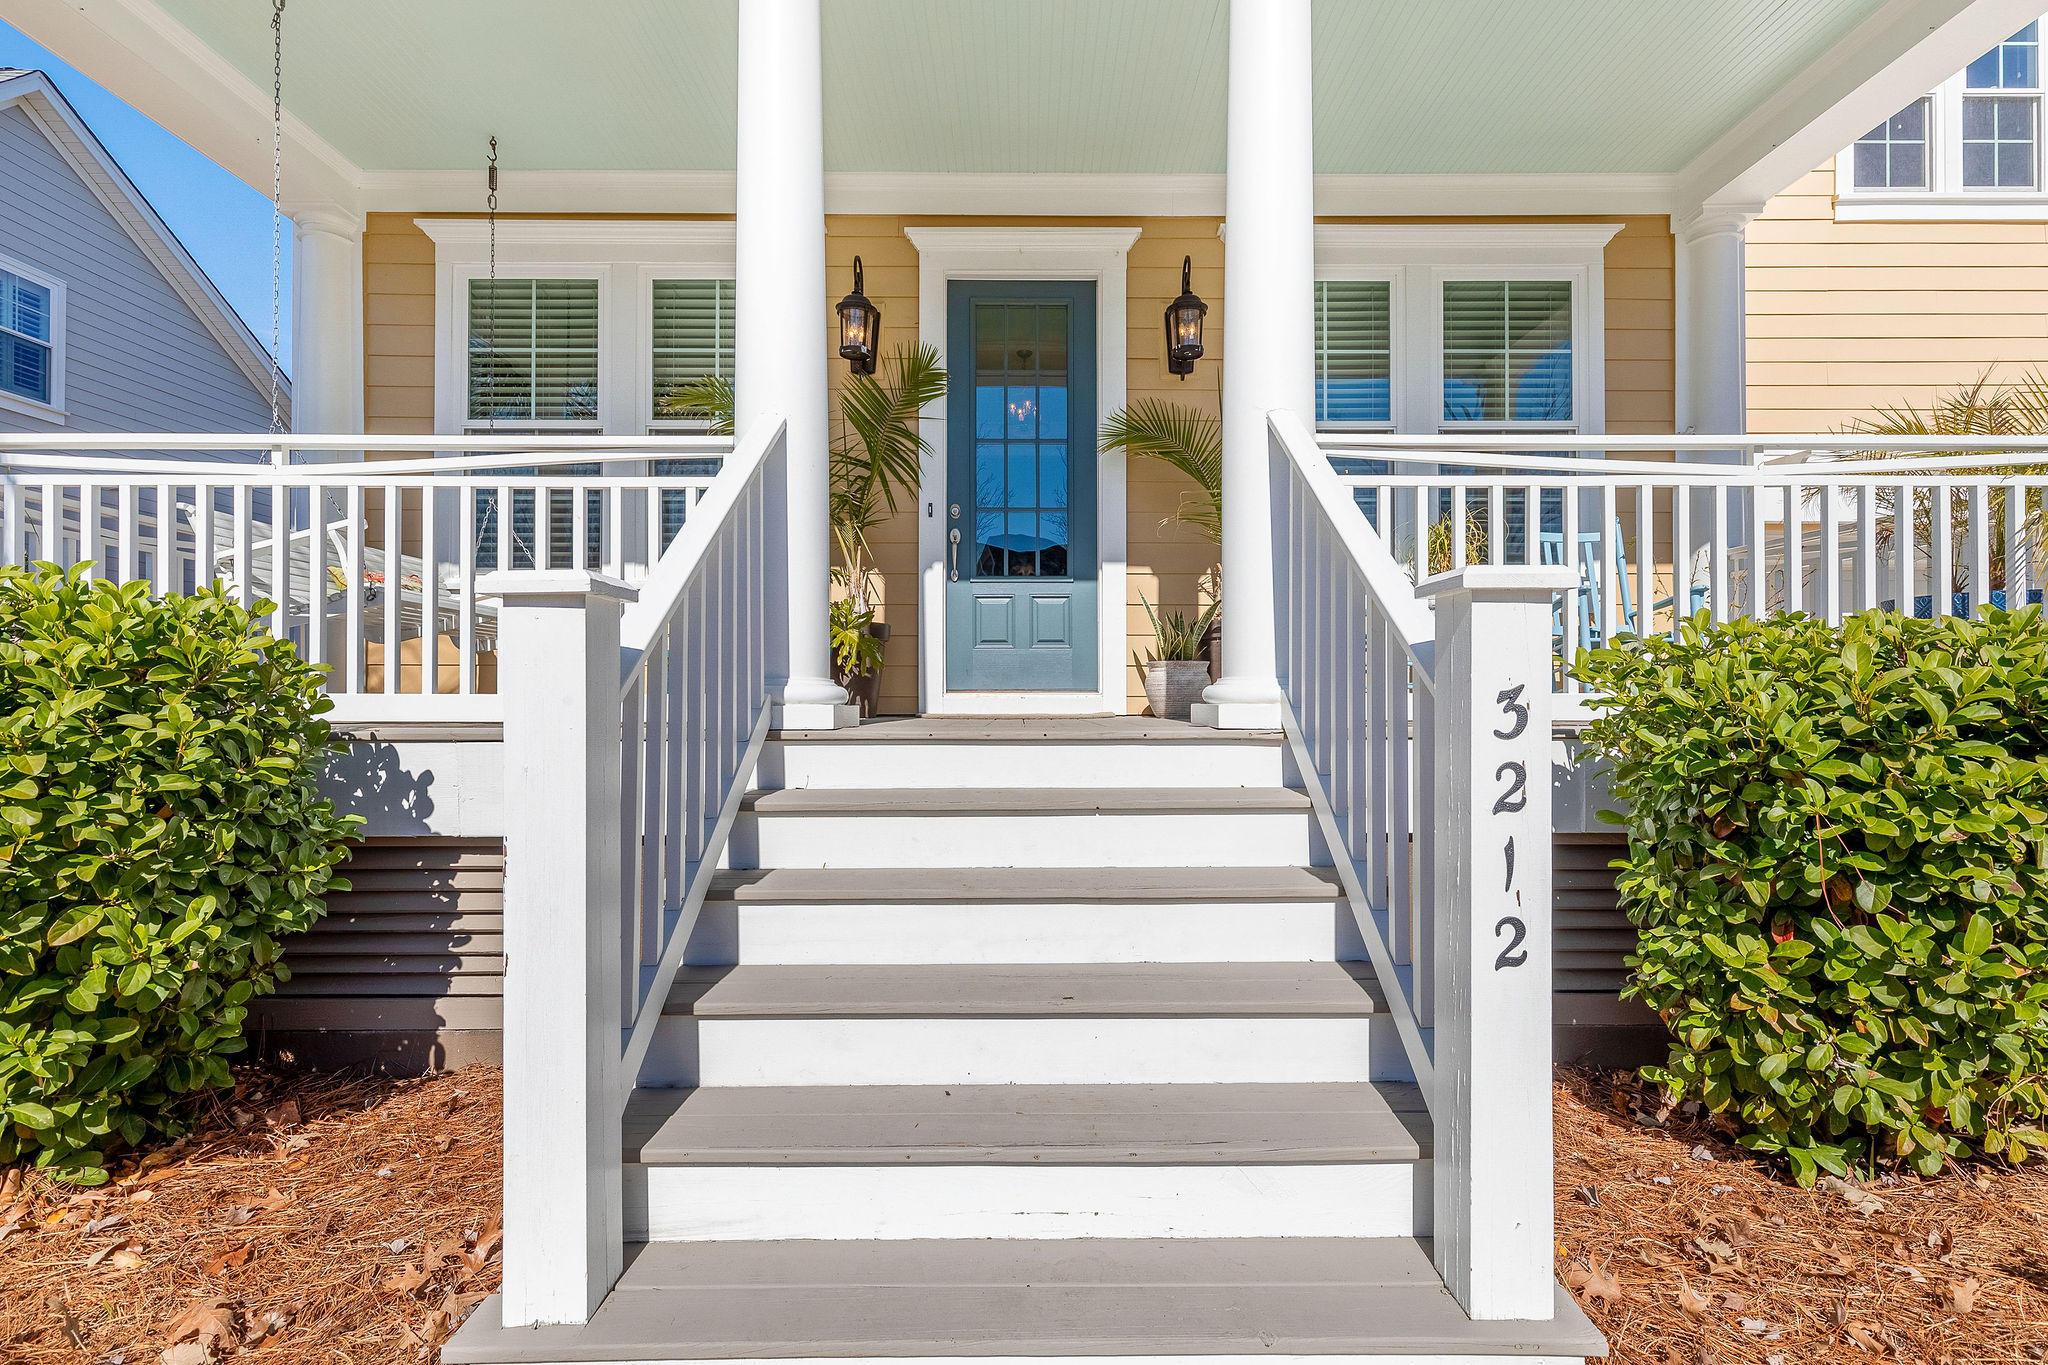 Dunes West Homes For Sale - 3212 Hatchway, Mount Pleasant, SC - 66